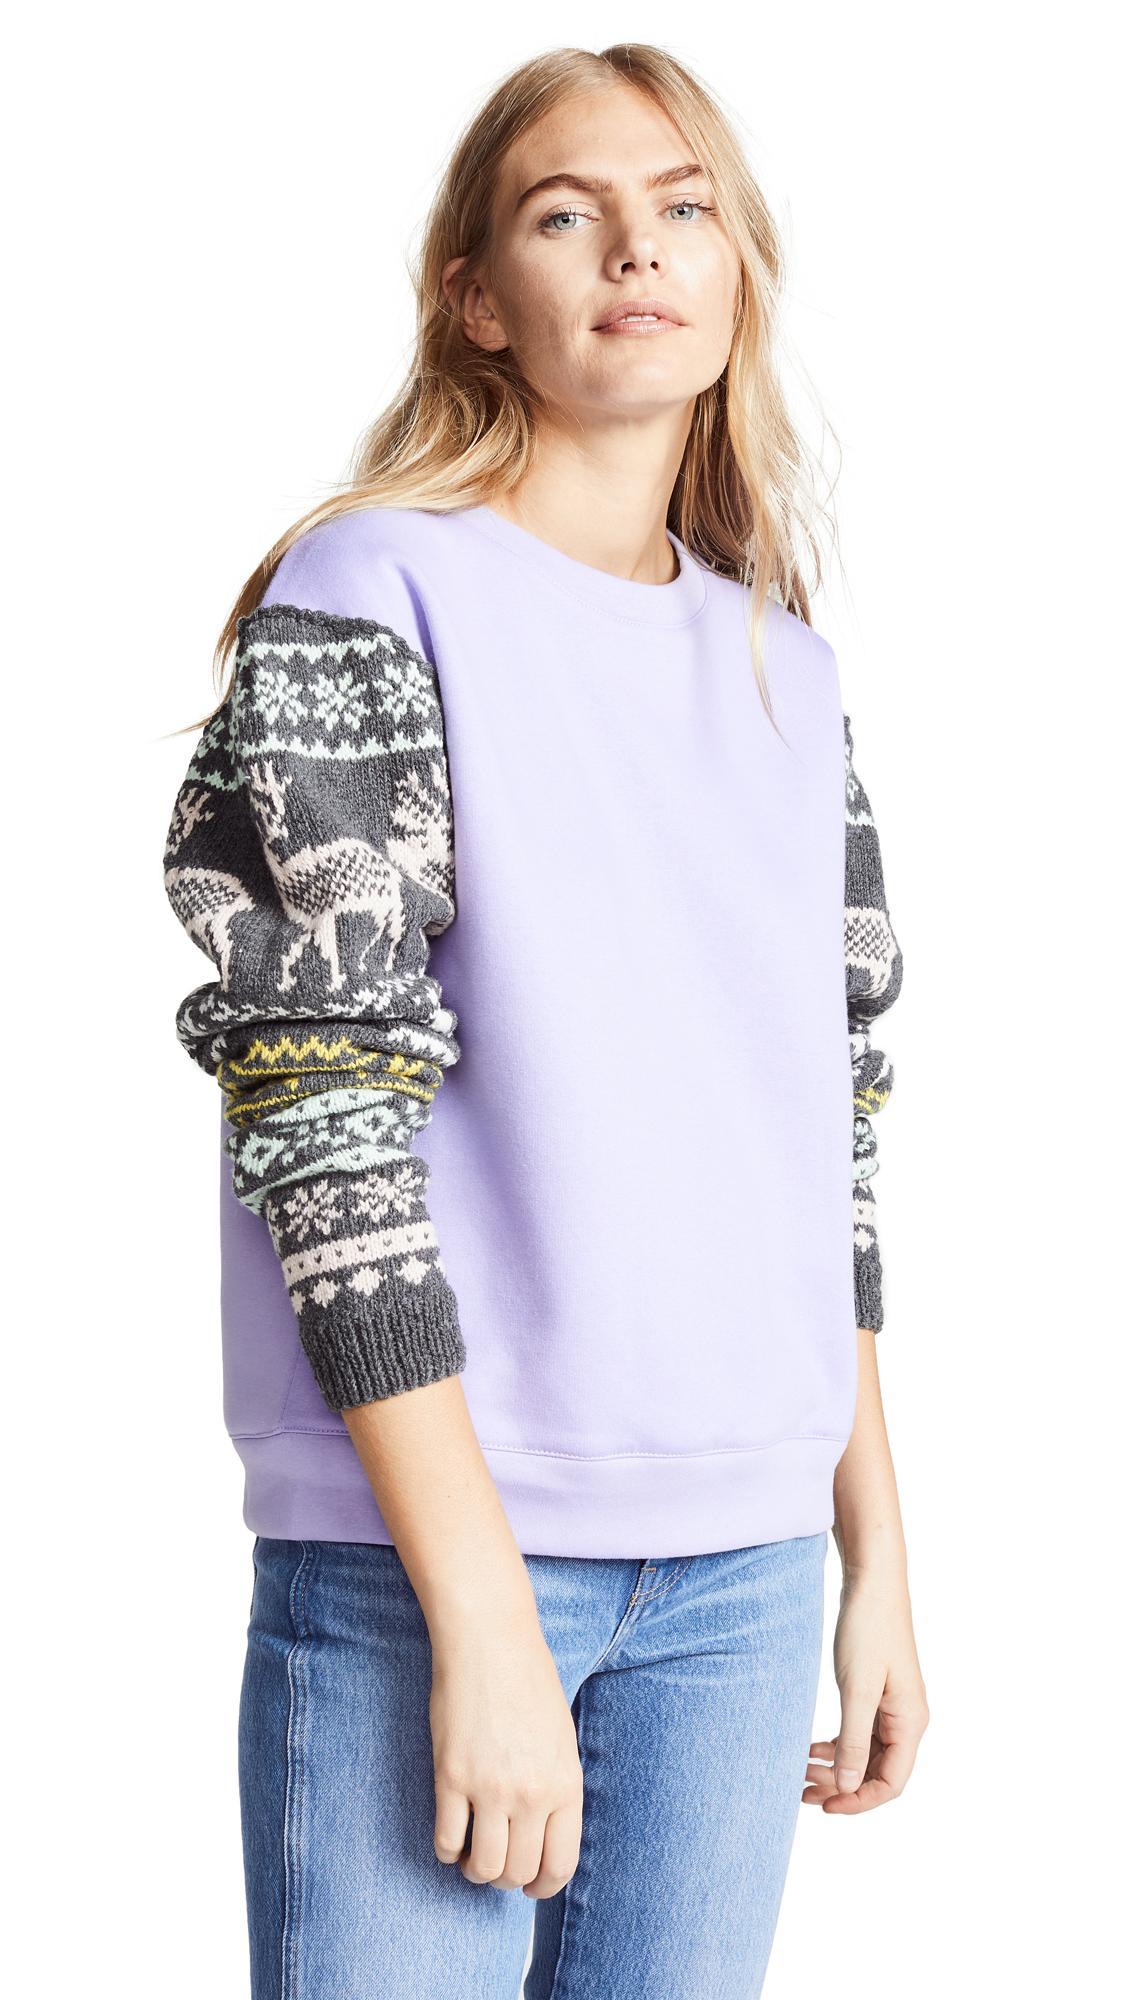 MICHAELA BUERGER Scandanavian Jacquard Sleeve Sweatshirt in Lilac